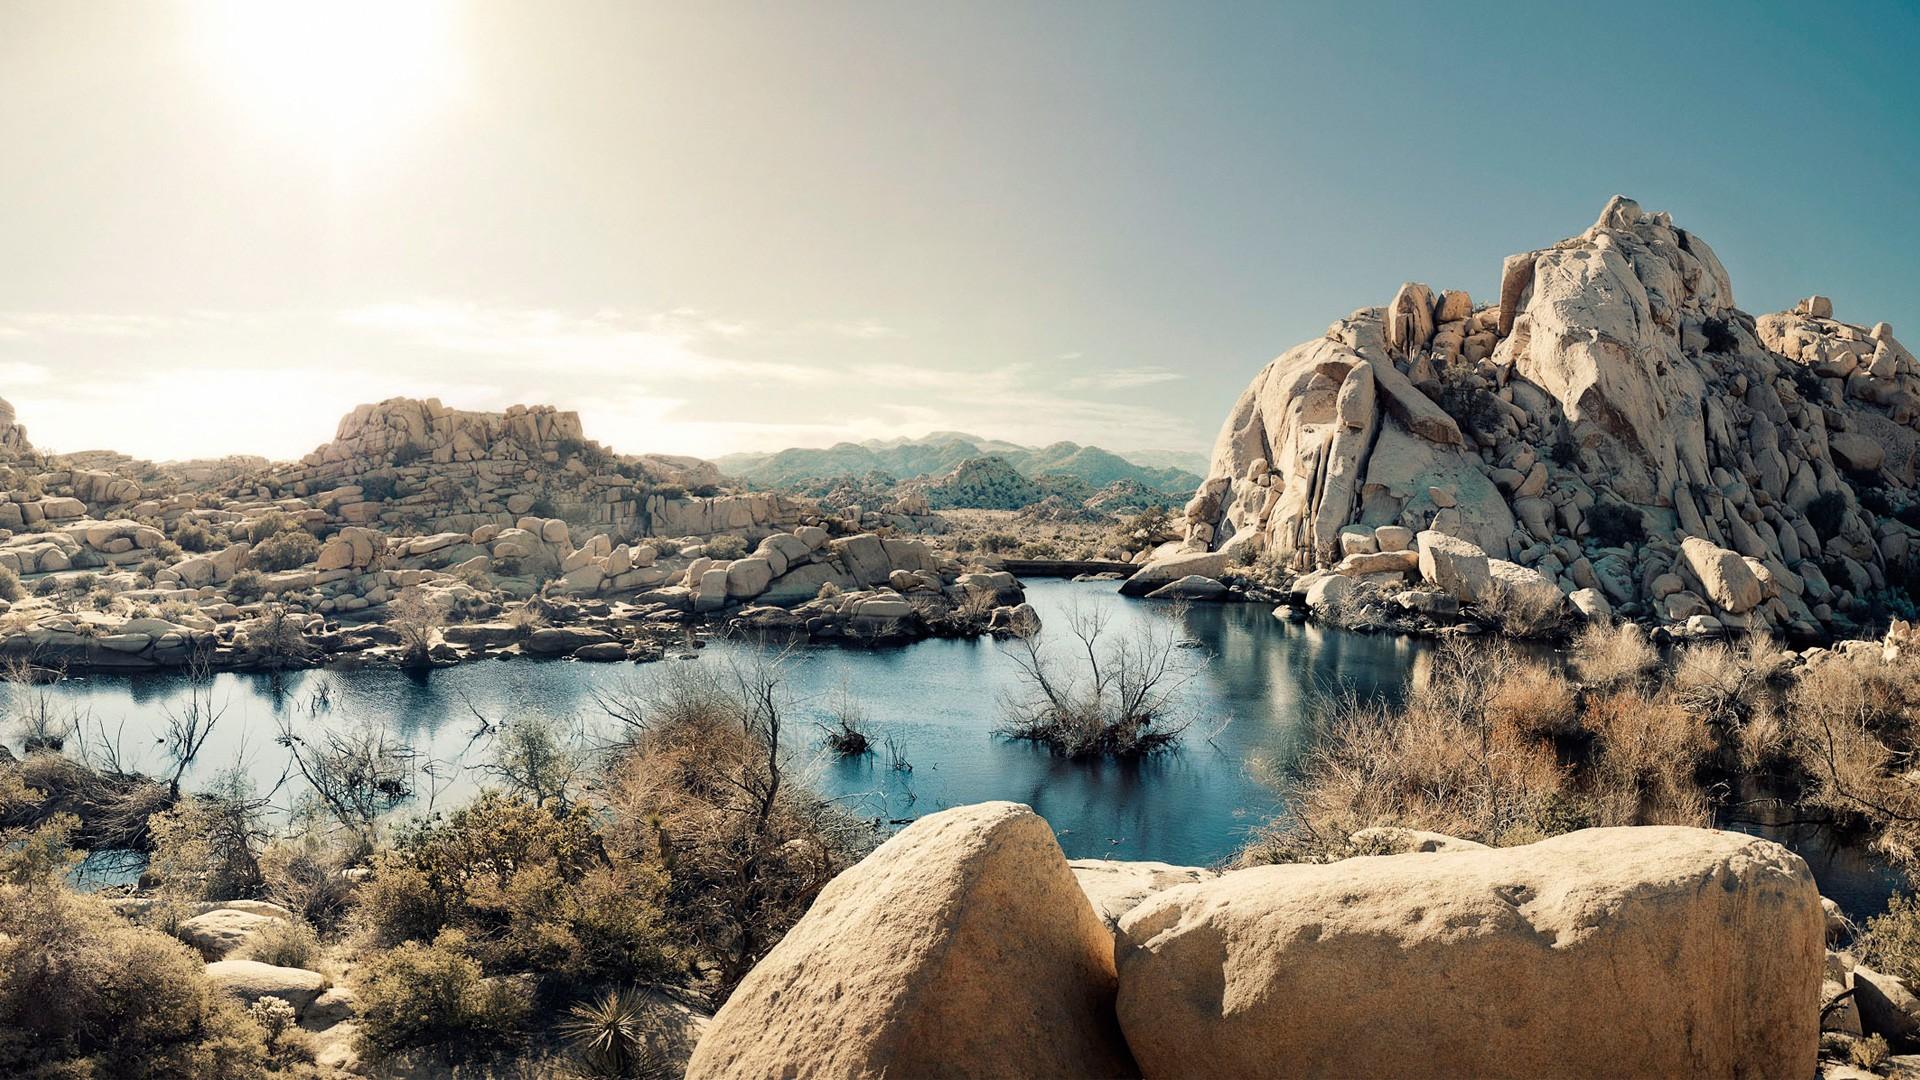 Pc Wallpaper 3d Love Desert Rock Formations Lake National Park California Us